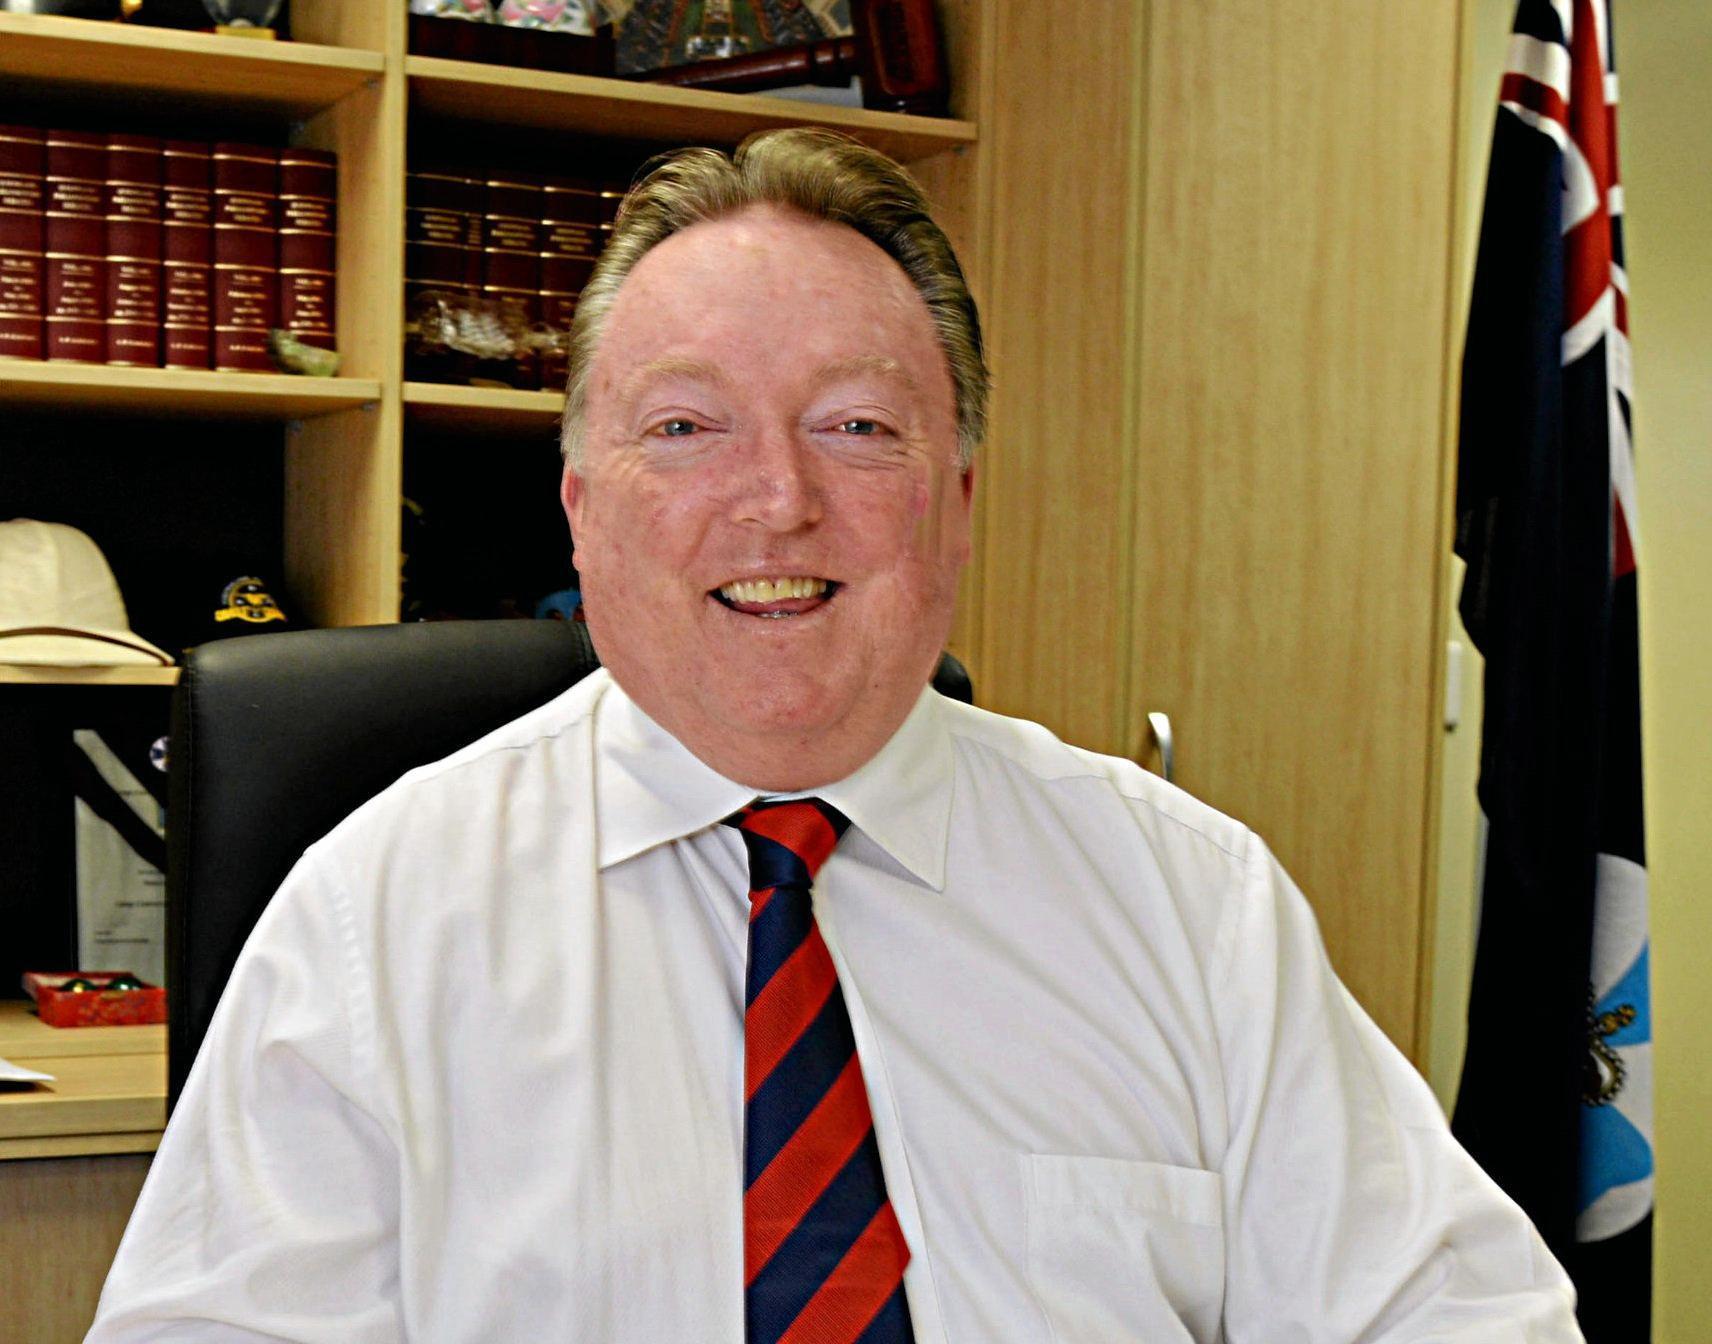 Noosa MP Glen Elmes.